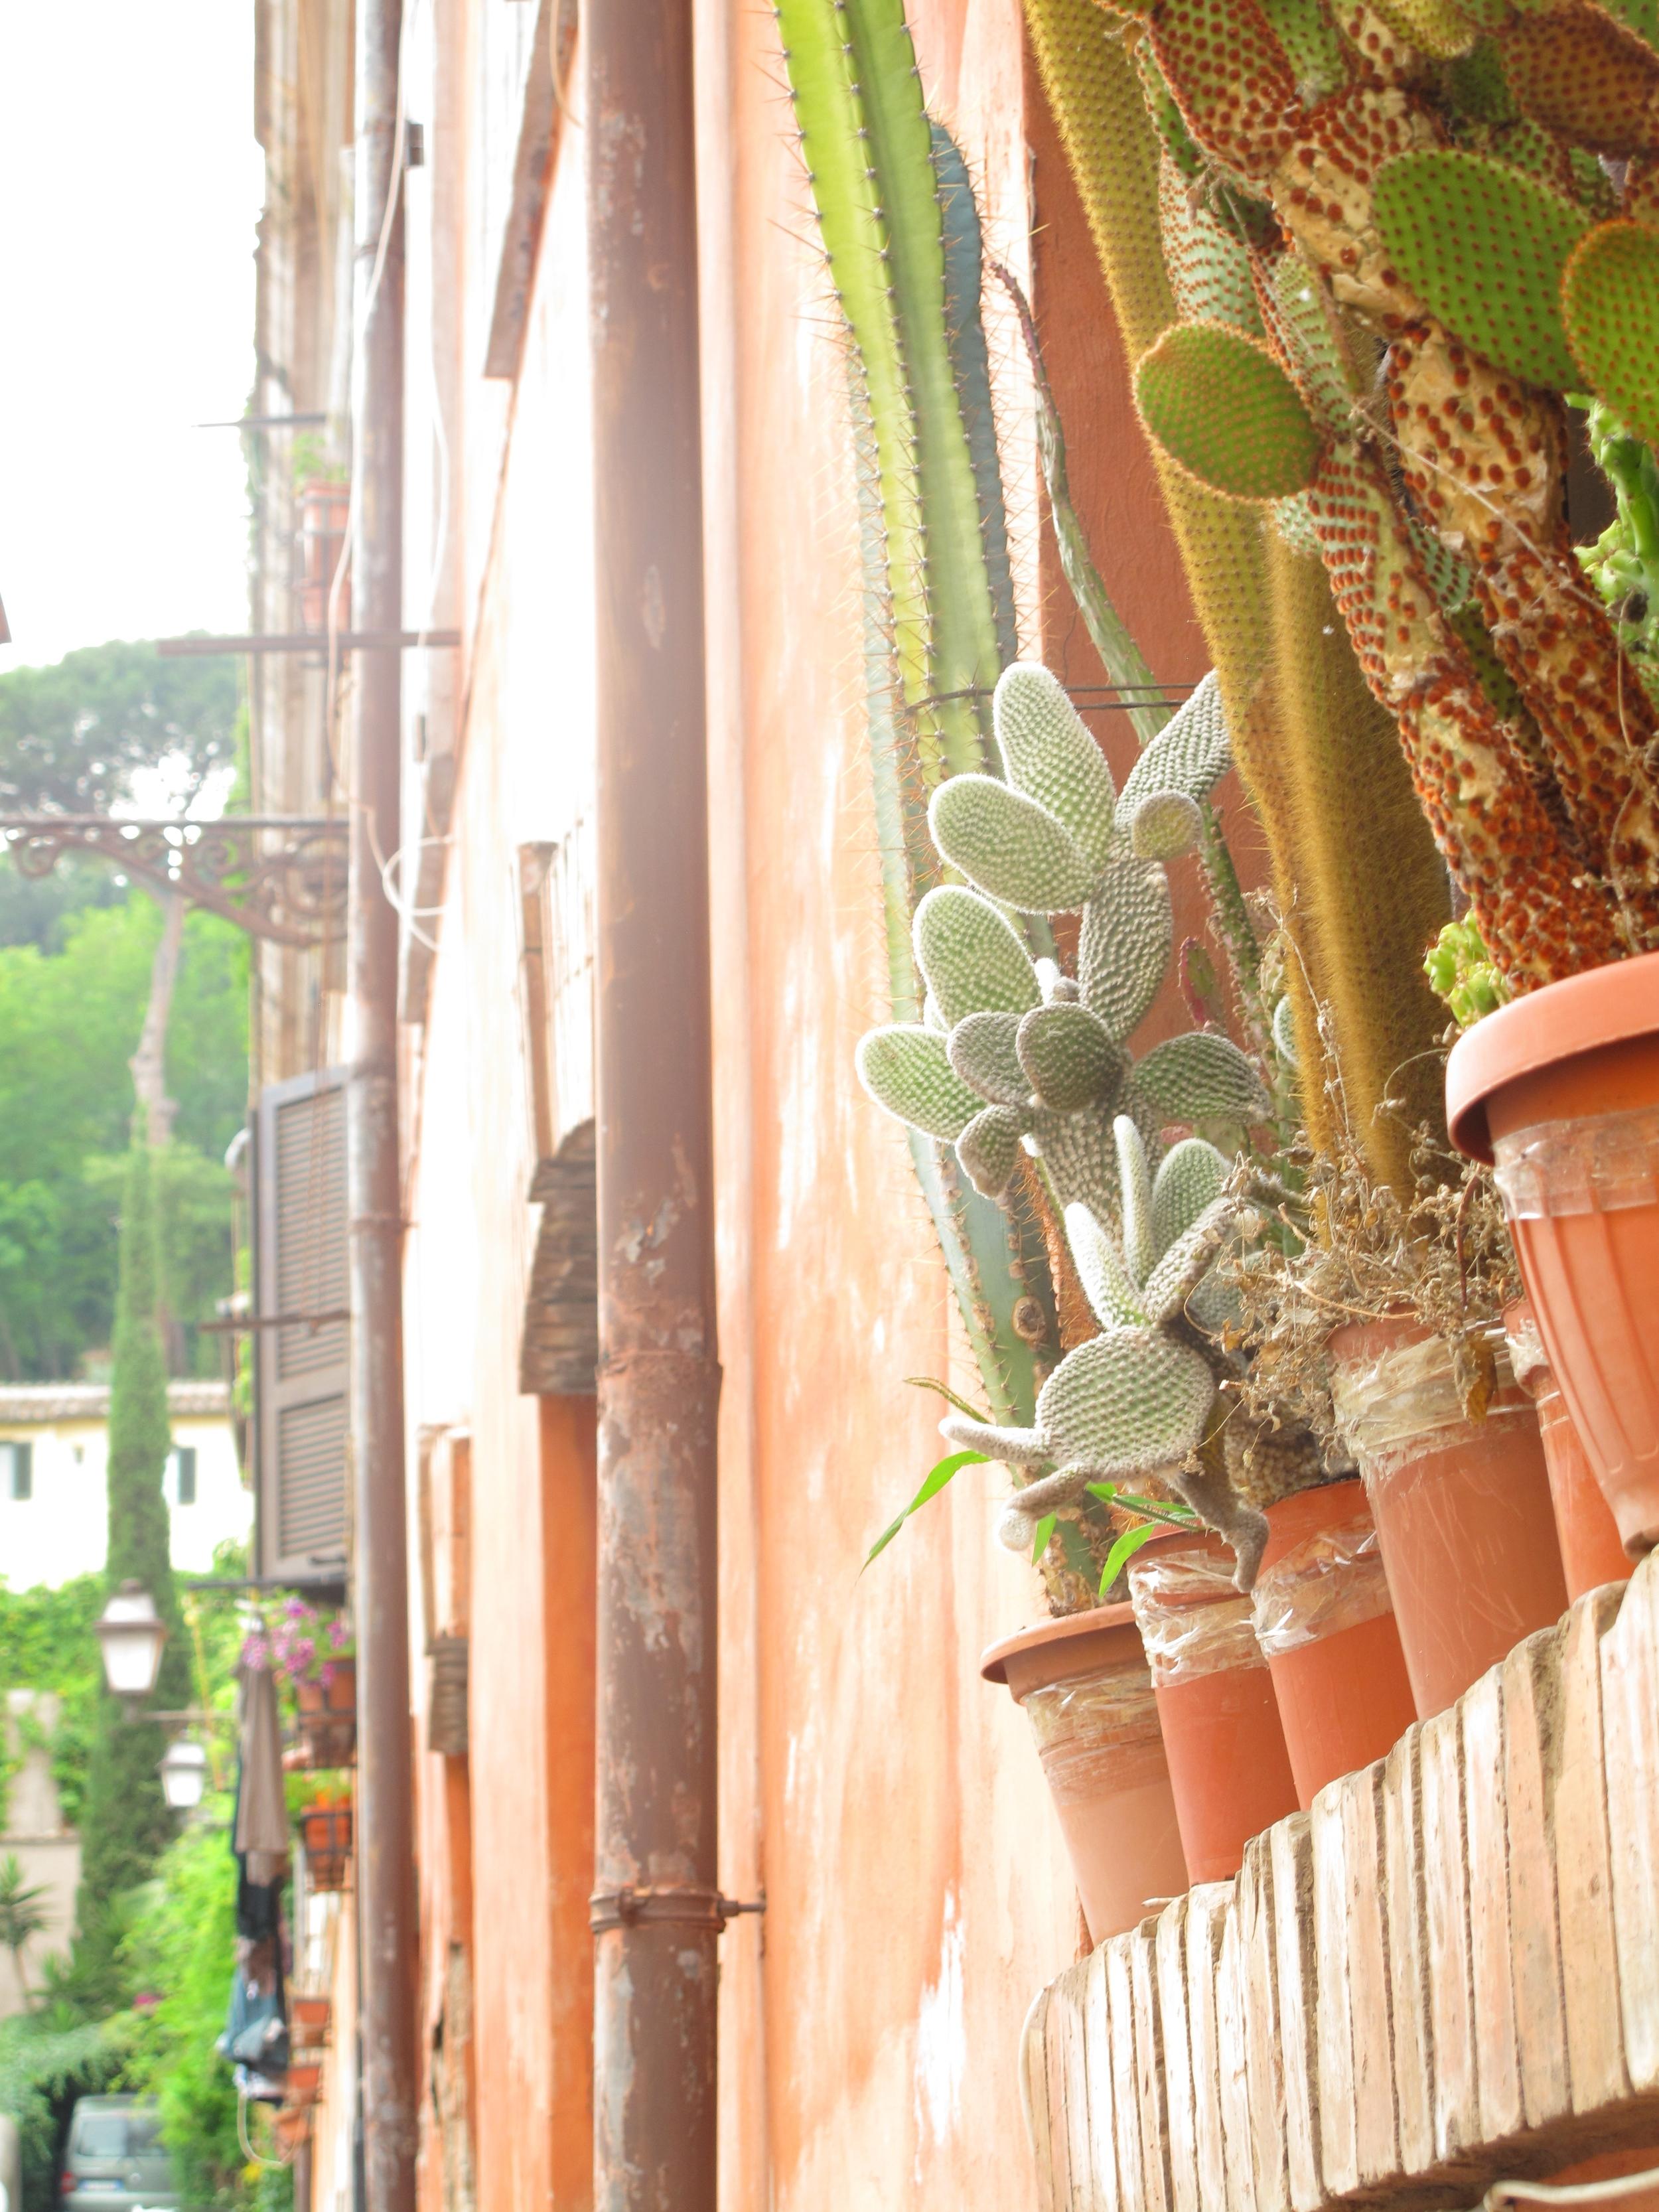 Cacti on a terracotta windowsill in Rome